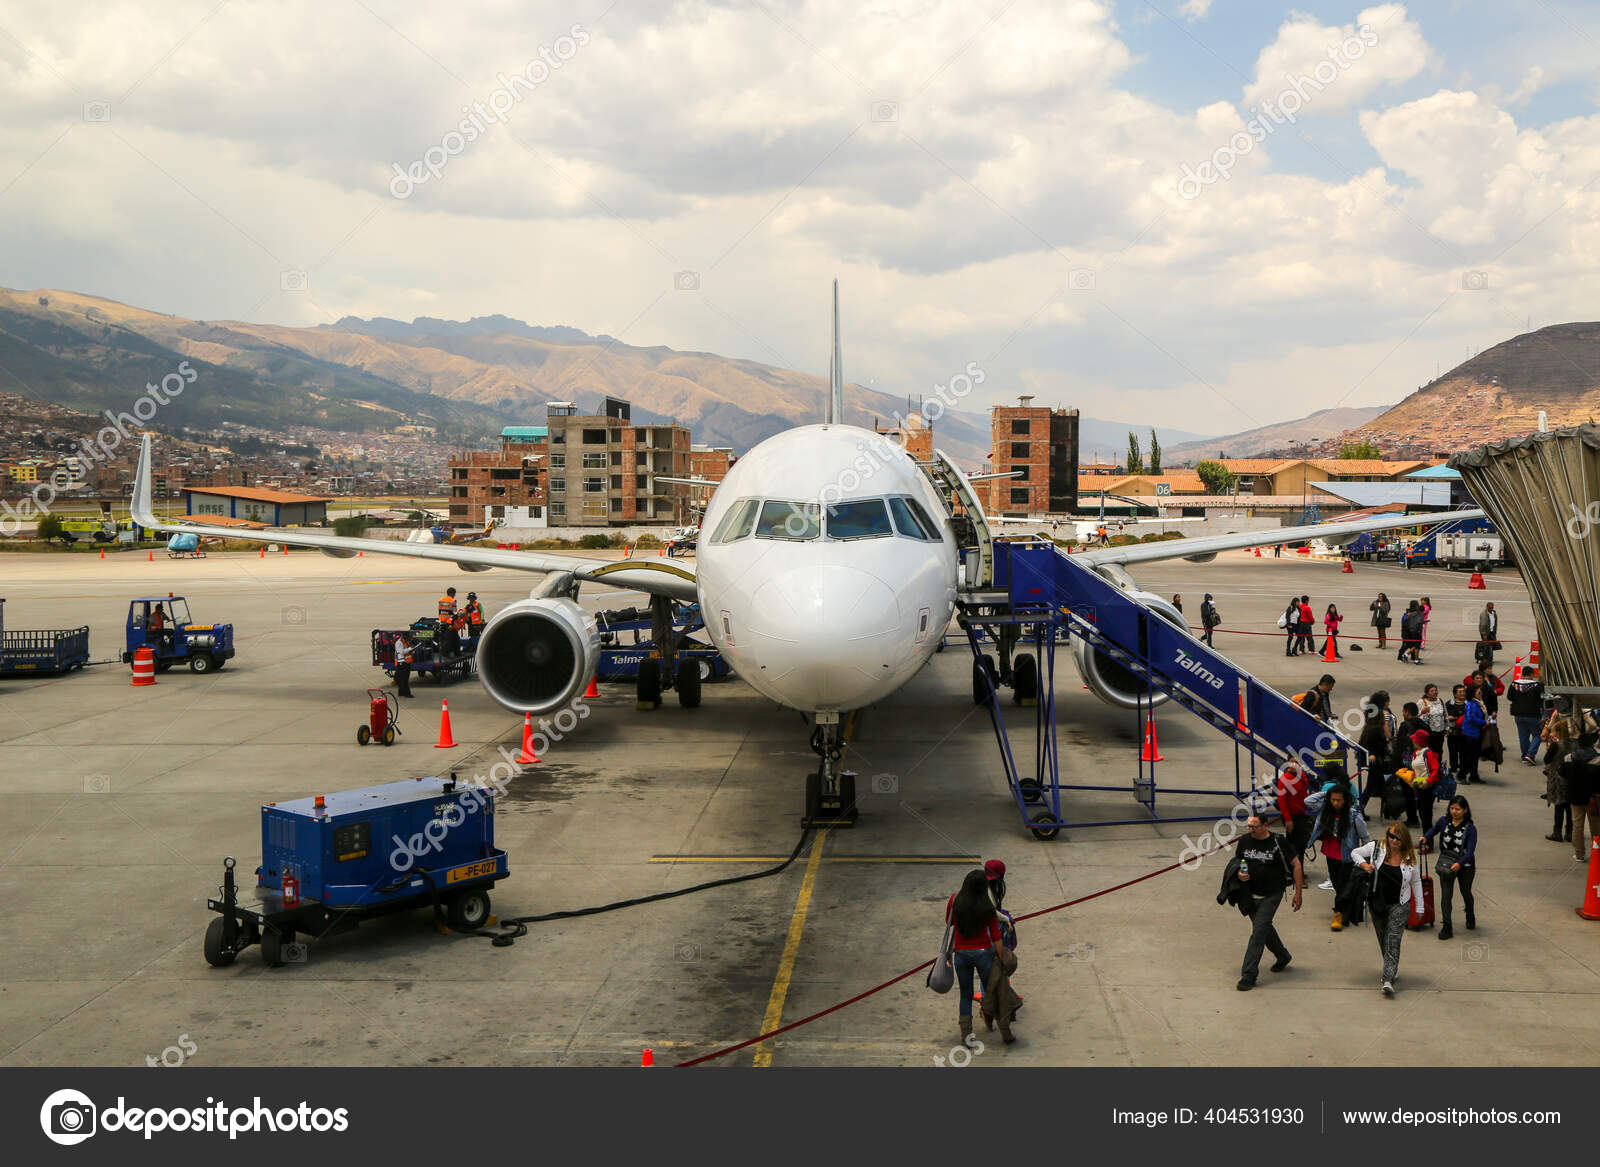 Cusco Peru Septiembre 2016 Avion Latam Airlines Aeropuerto Internacional Alejandro Foto Editorial De Stock C Zhukovsky 404531930